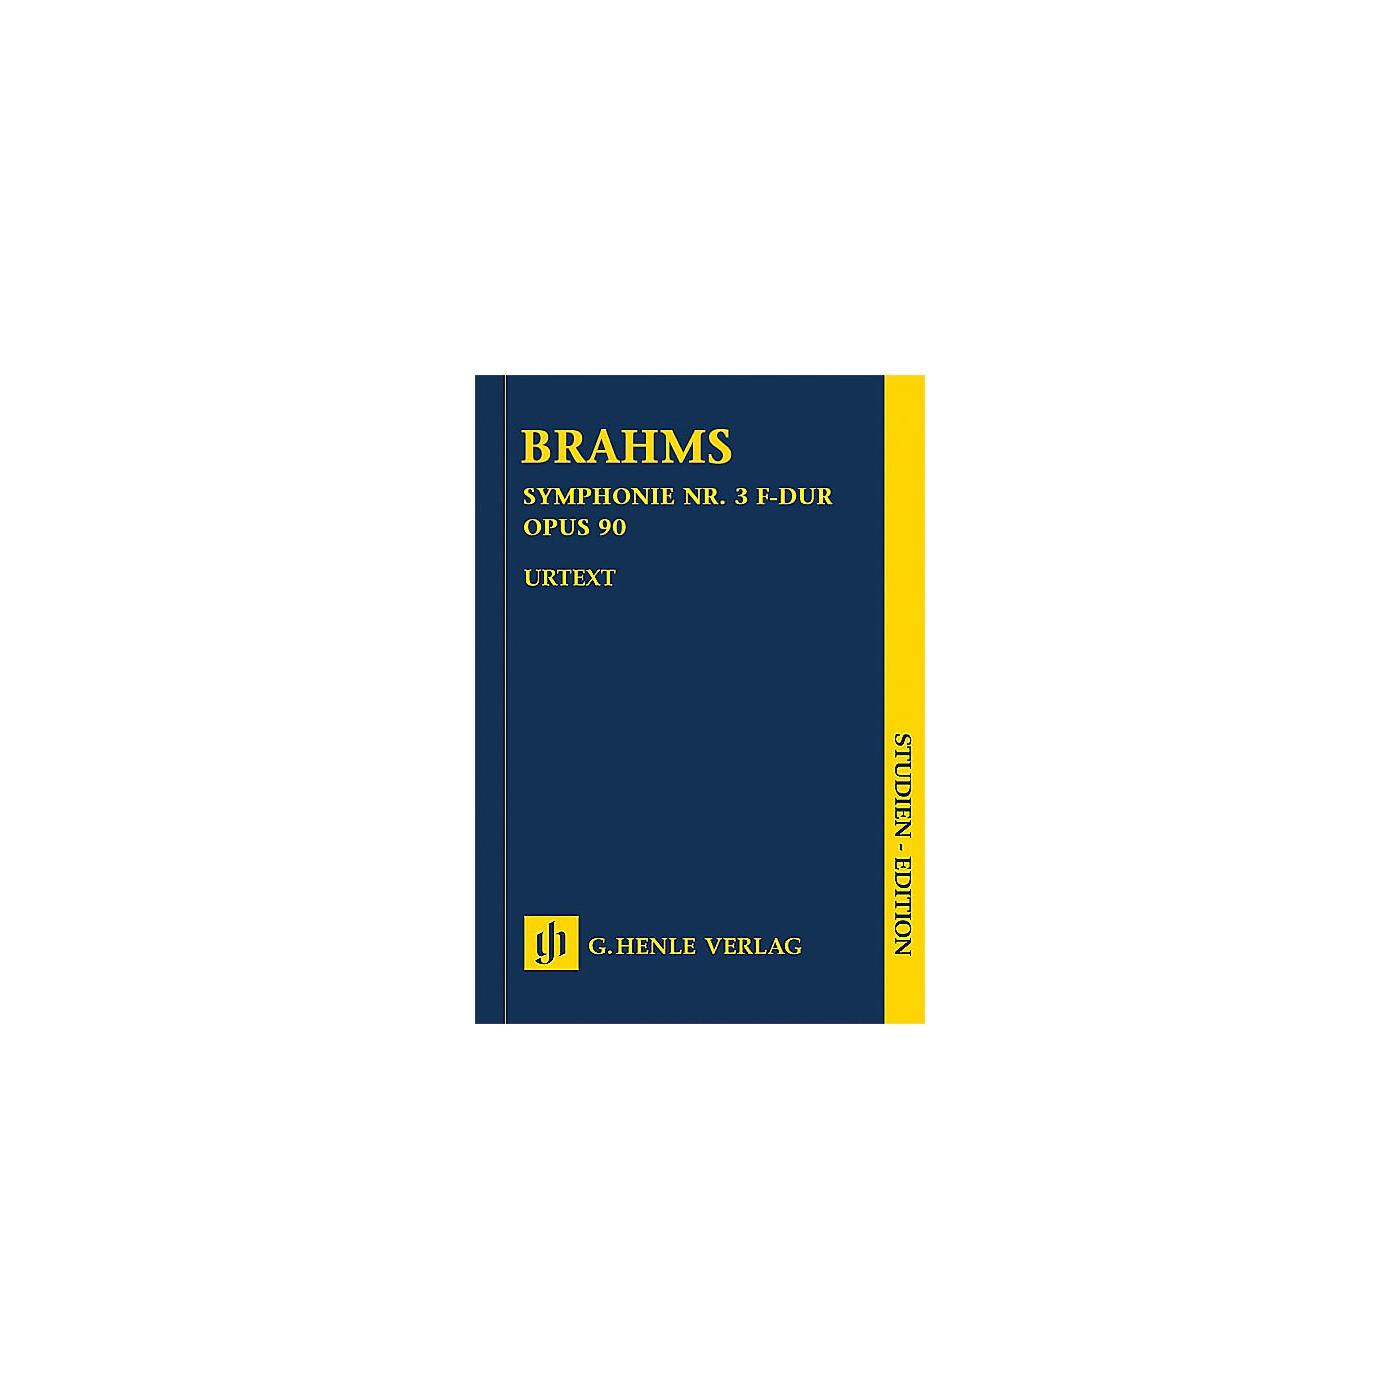 G. Henle Verlag Johannes Brahms - Symphony No. 3 in F Major Op. 90 Henle Music Folios Series Softcover by Johannes Brahms thumbnail